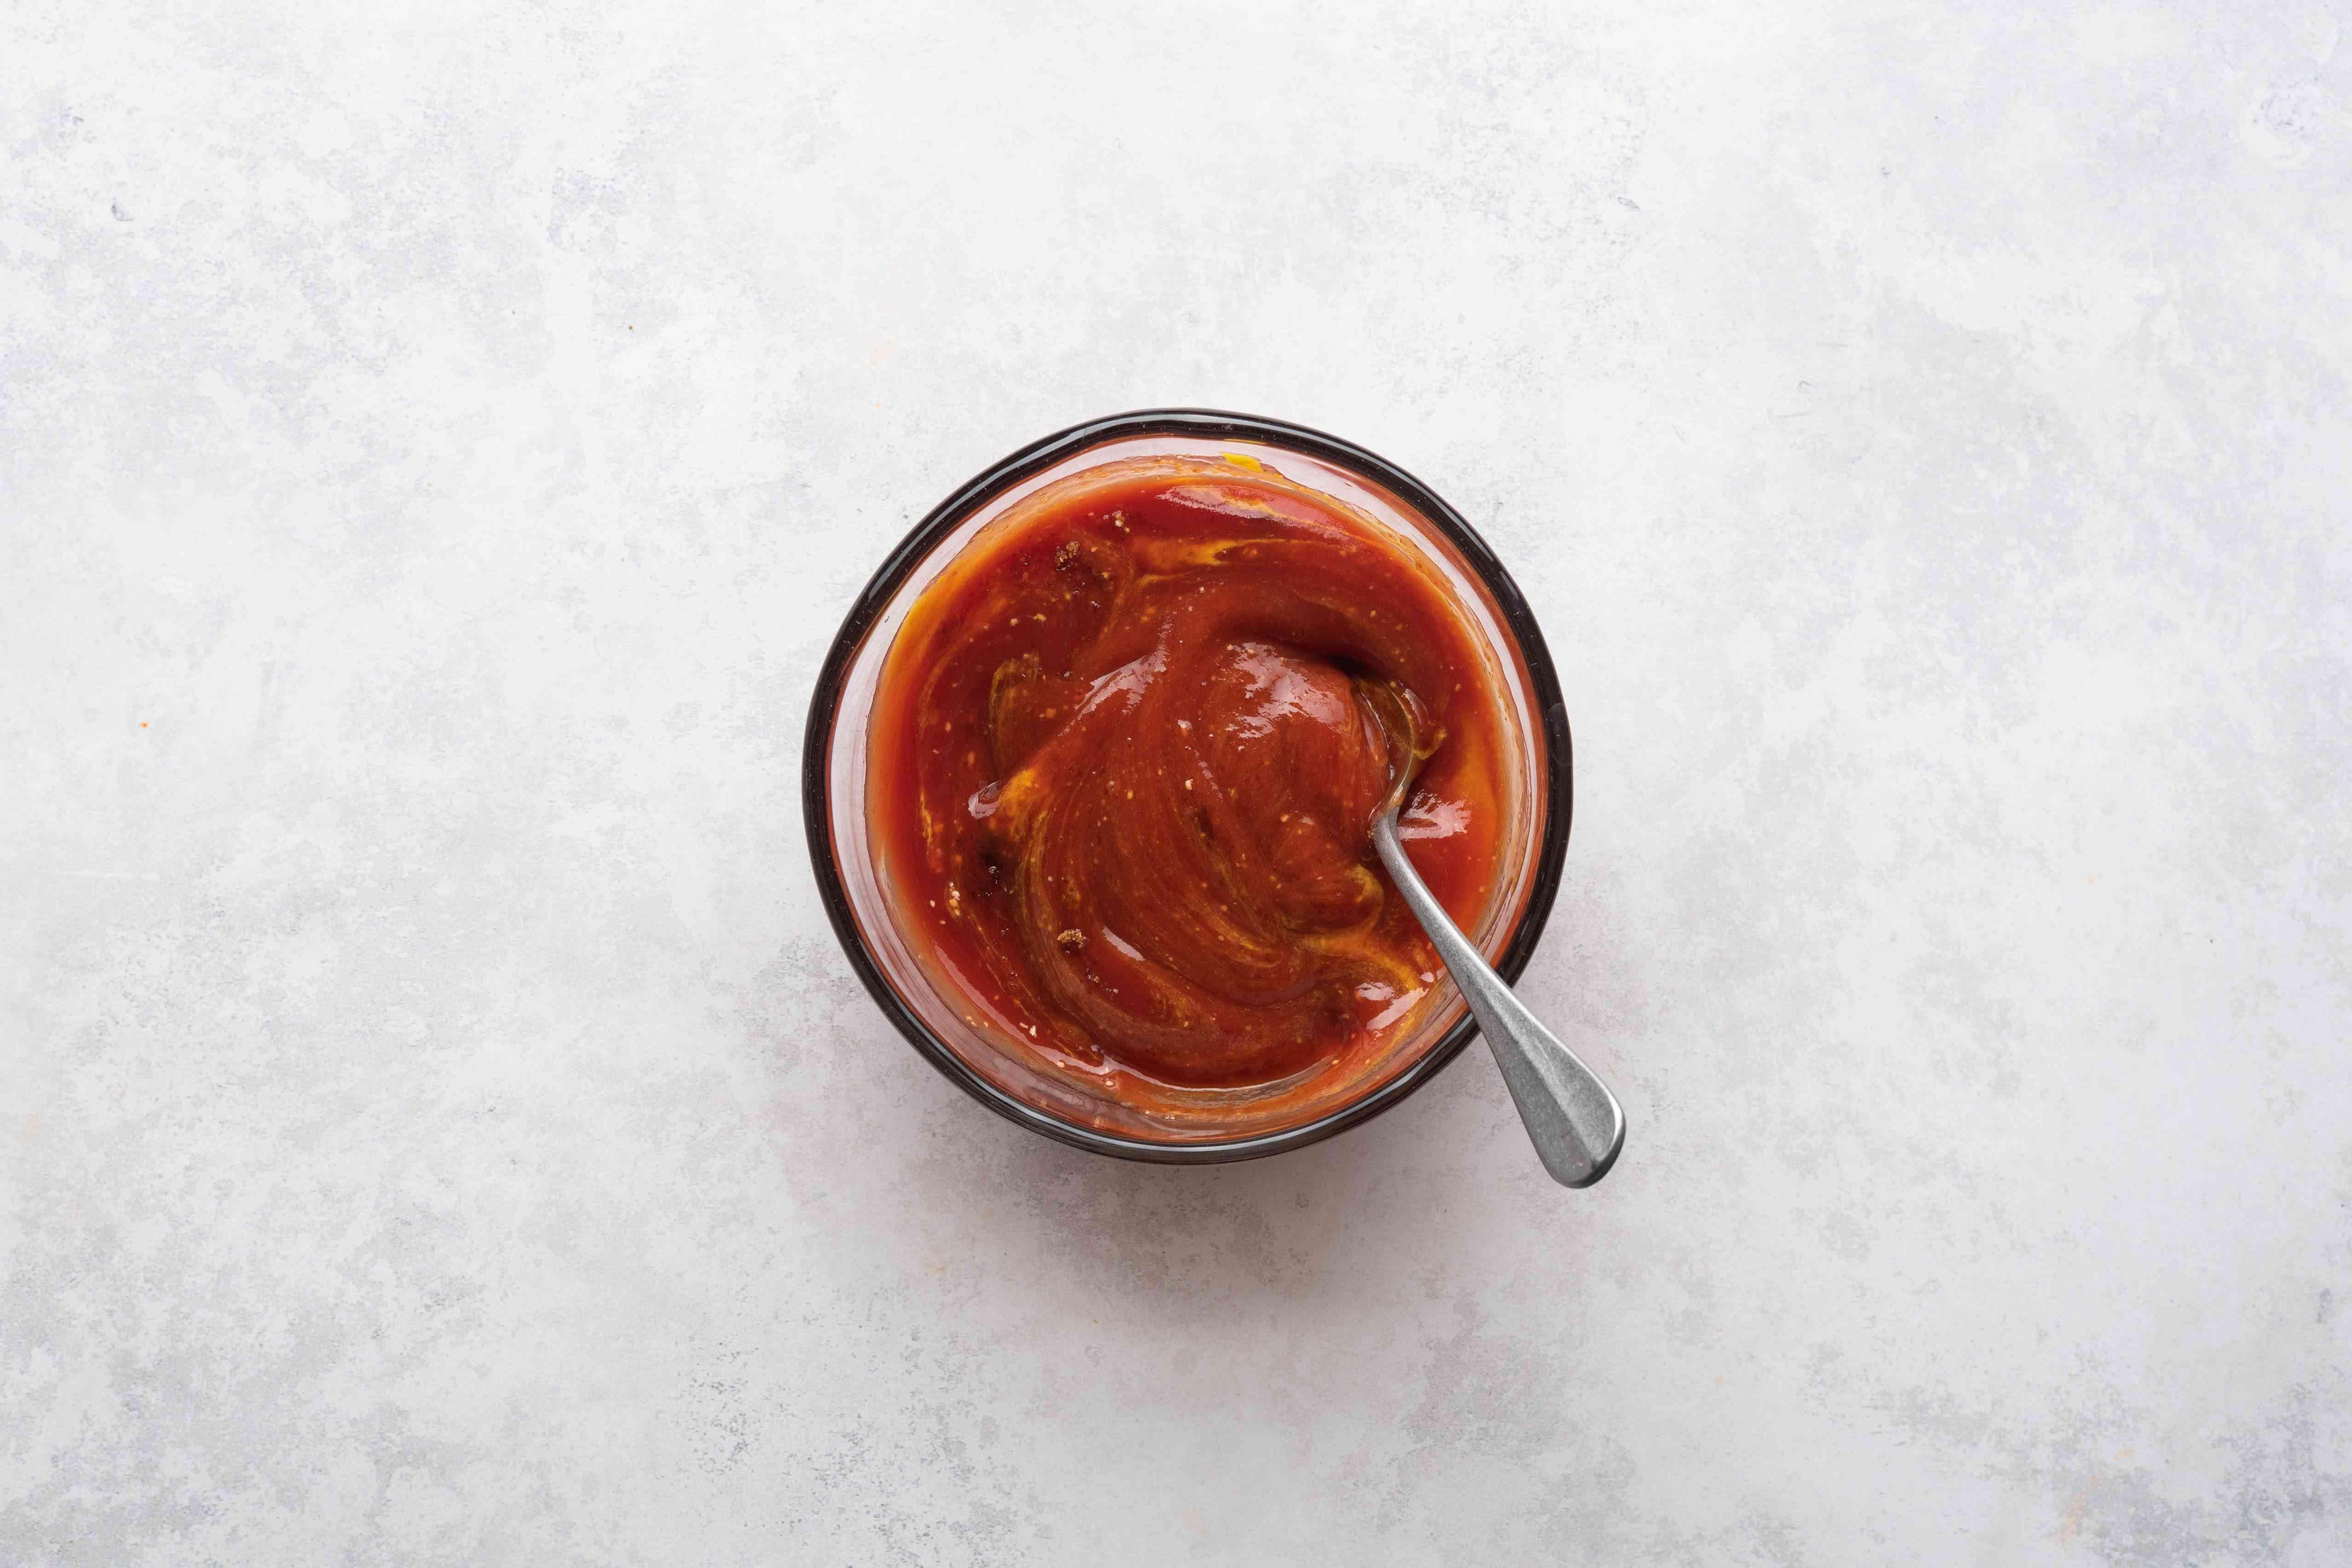 combine the garlic powder, prepared mustard, ketchup, and brown sugar in a bowl